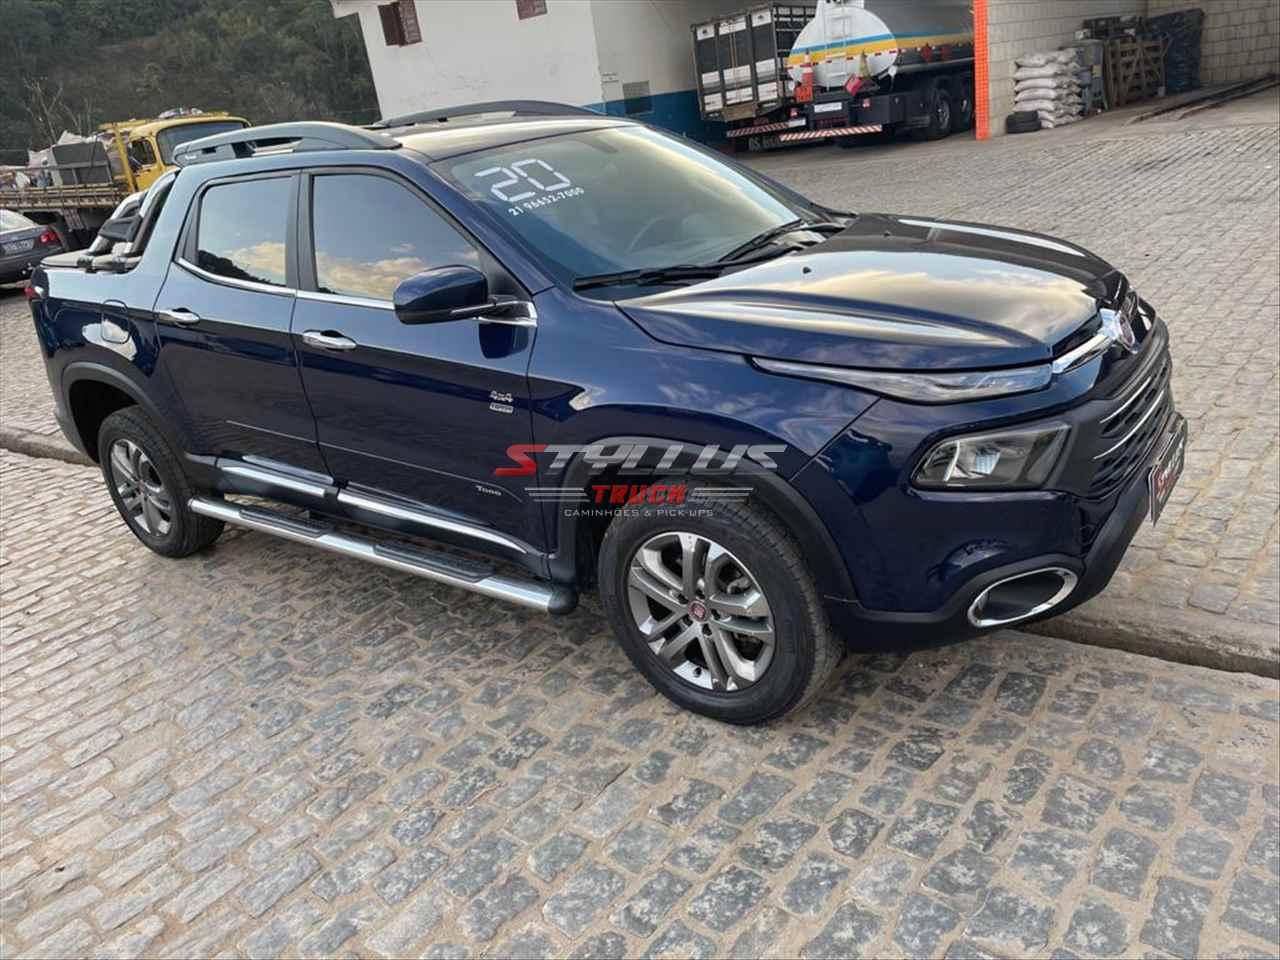 CARRO FIAT Toro Freedom 2.0 Styllus Truck TERESOPOLIS RIO DE JANEIRO RJ